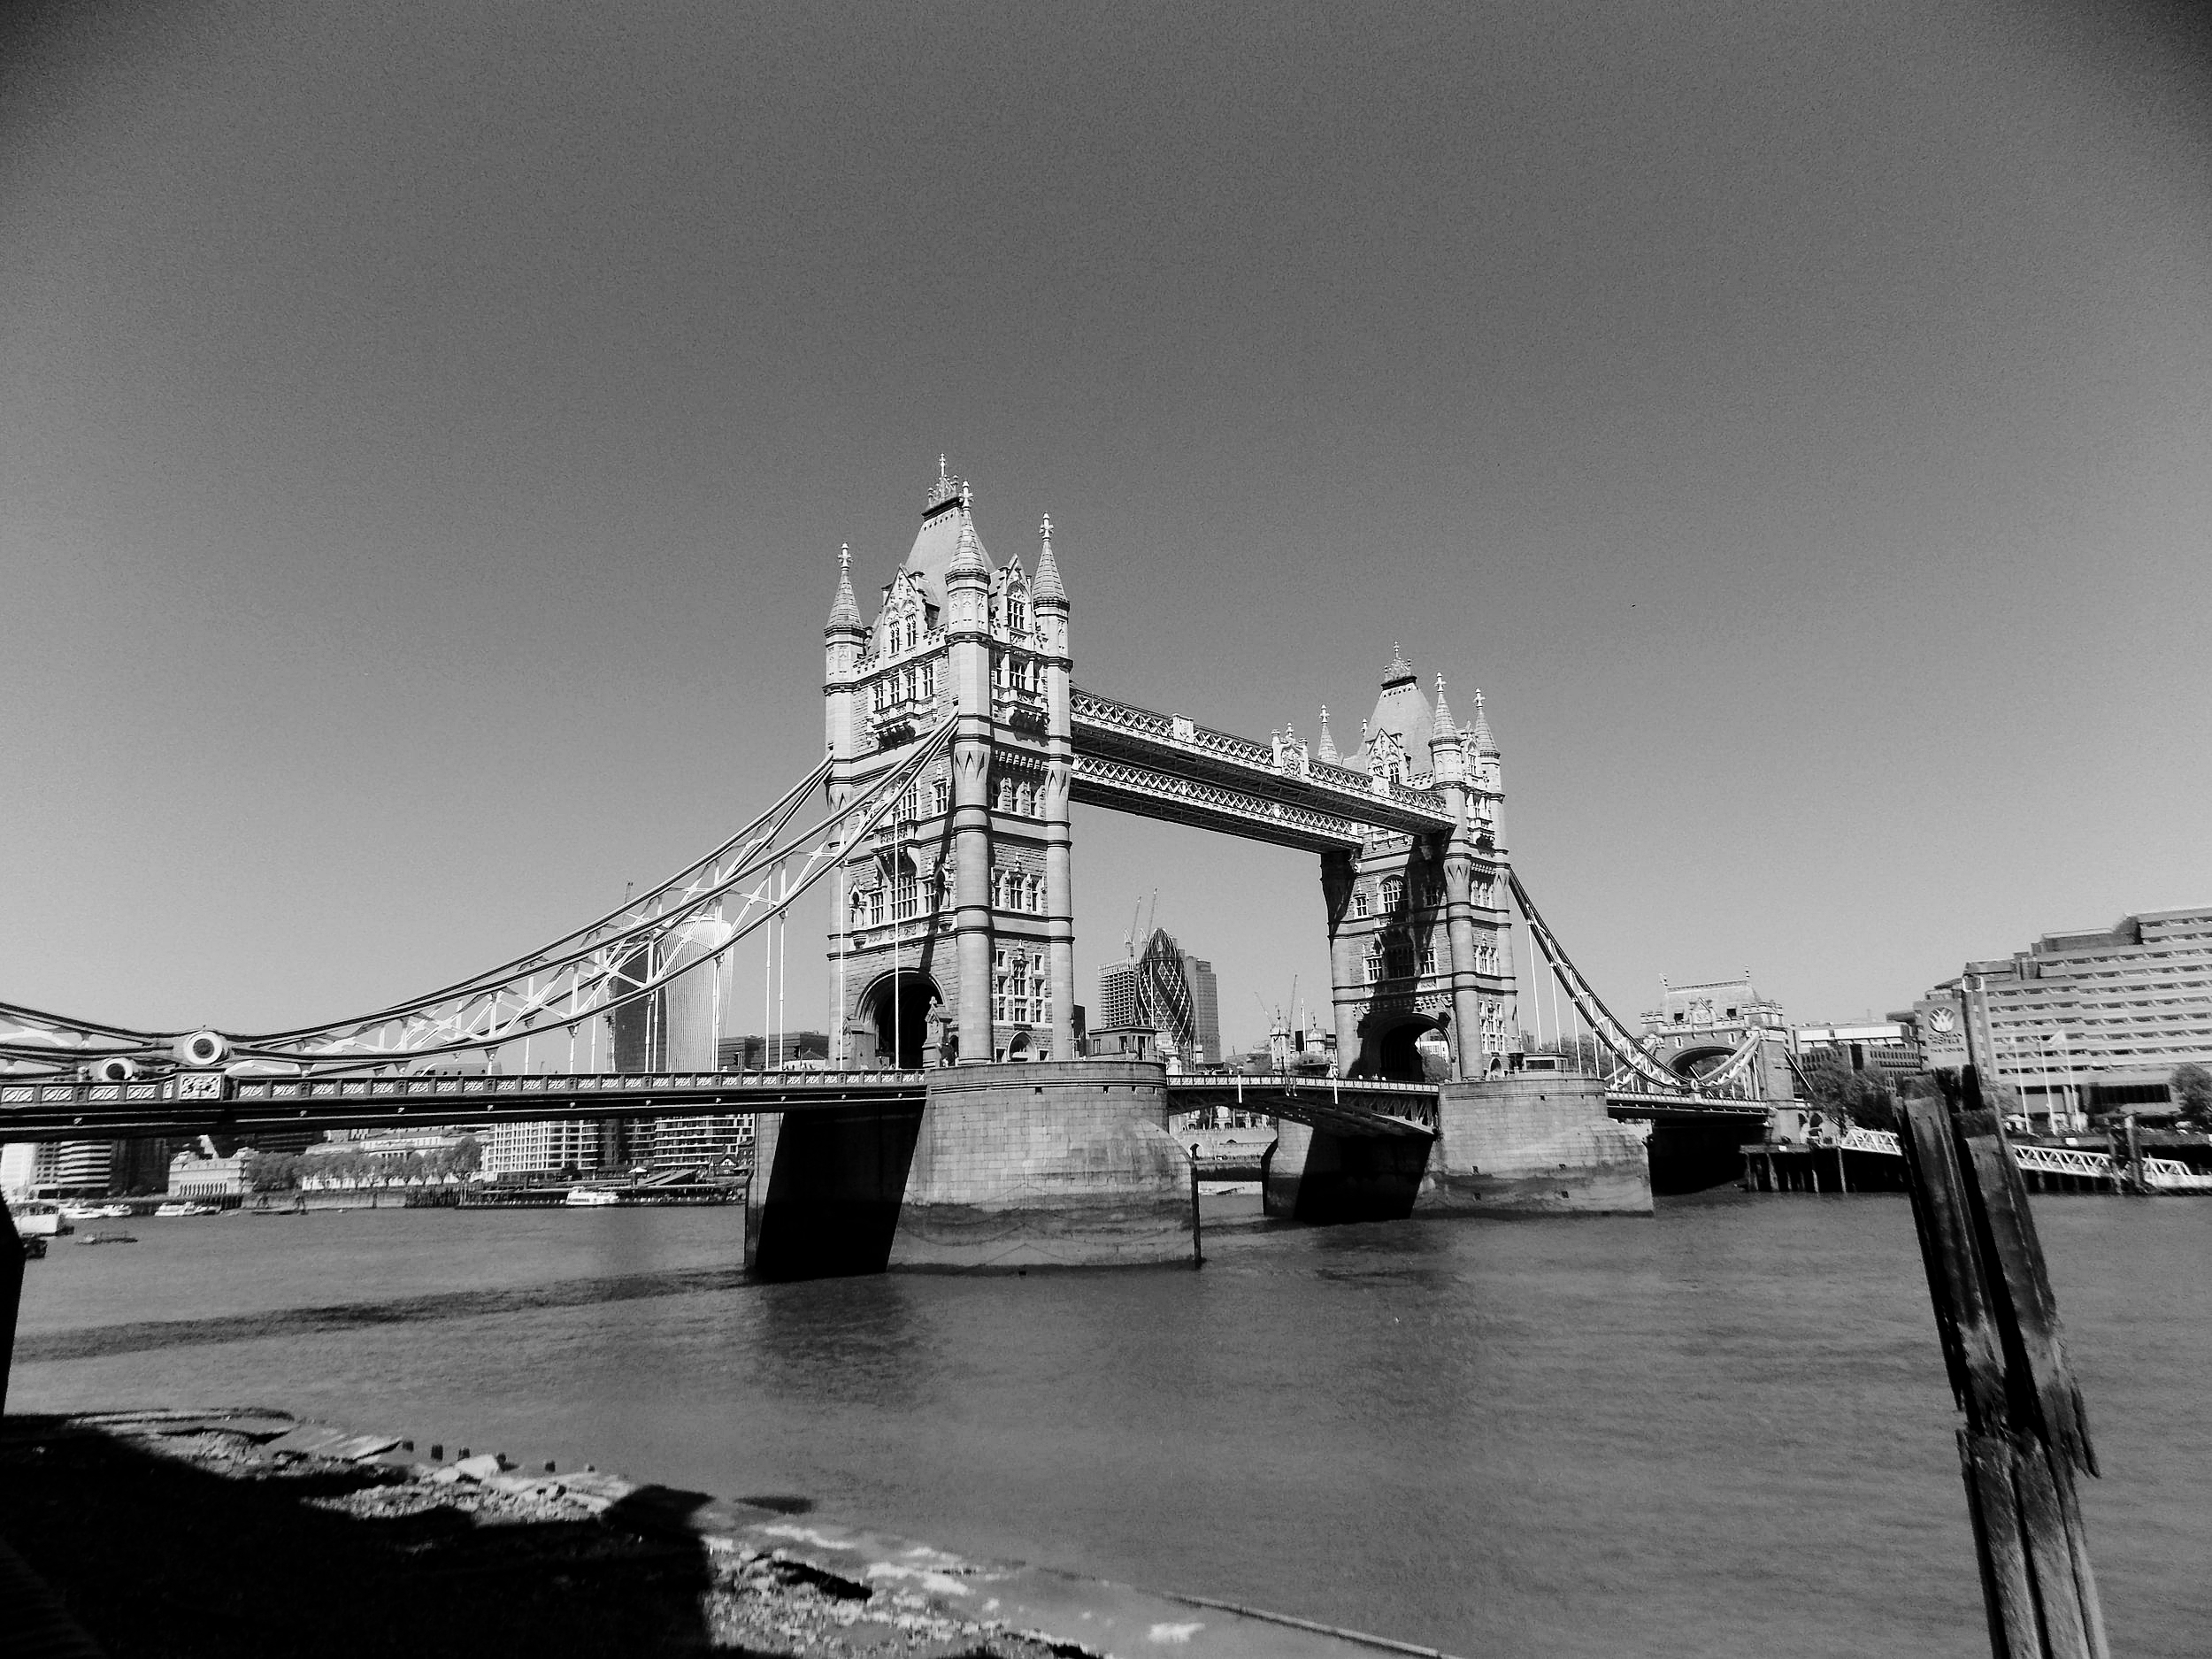 Personal Trainer London Tower bridge Samuel Figueroa